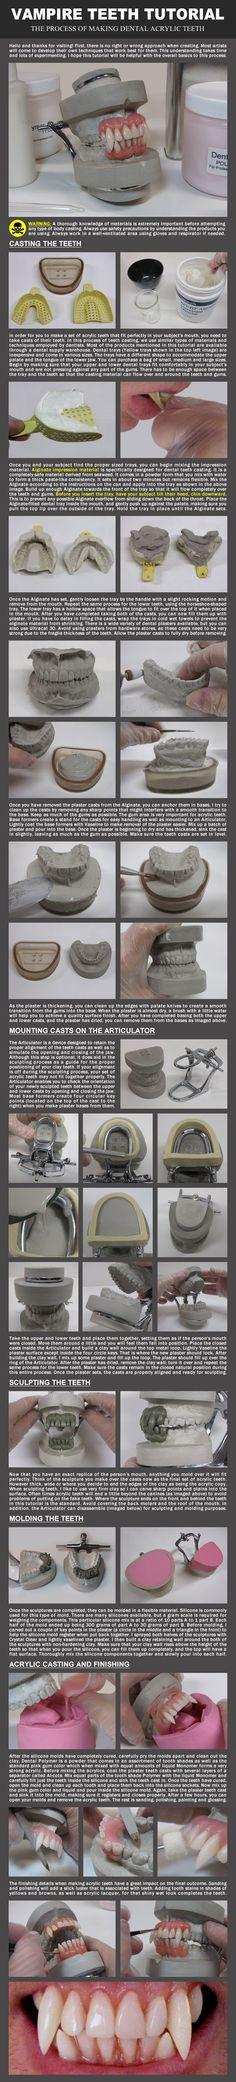 Homemade Acrylic Fangs